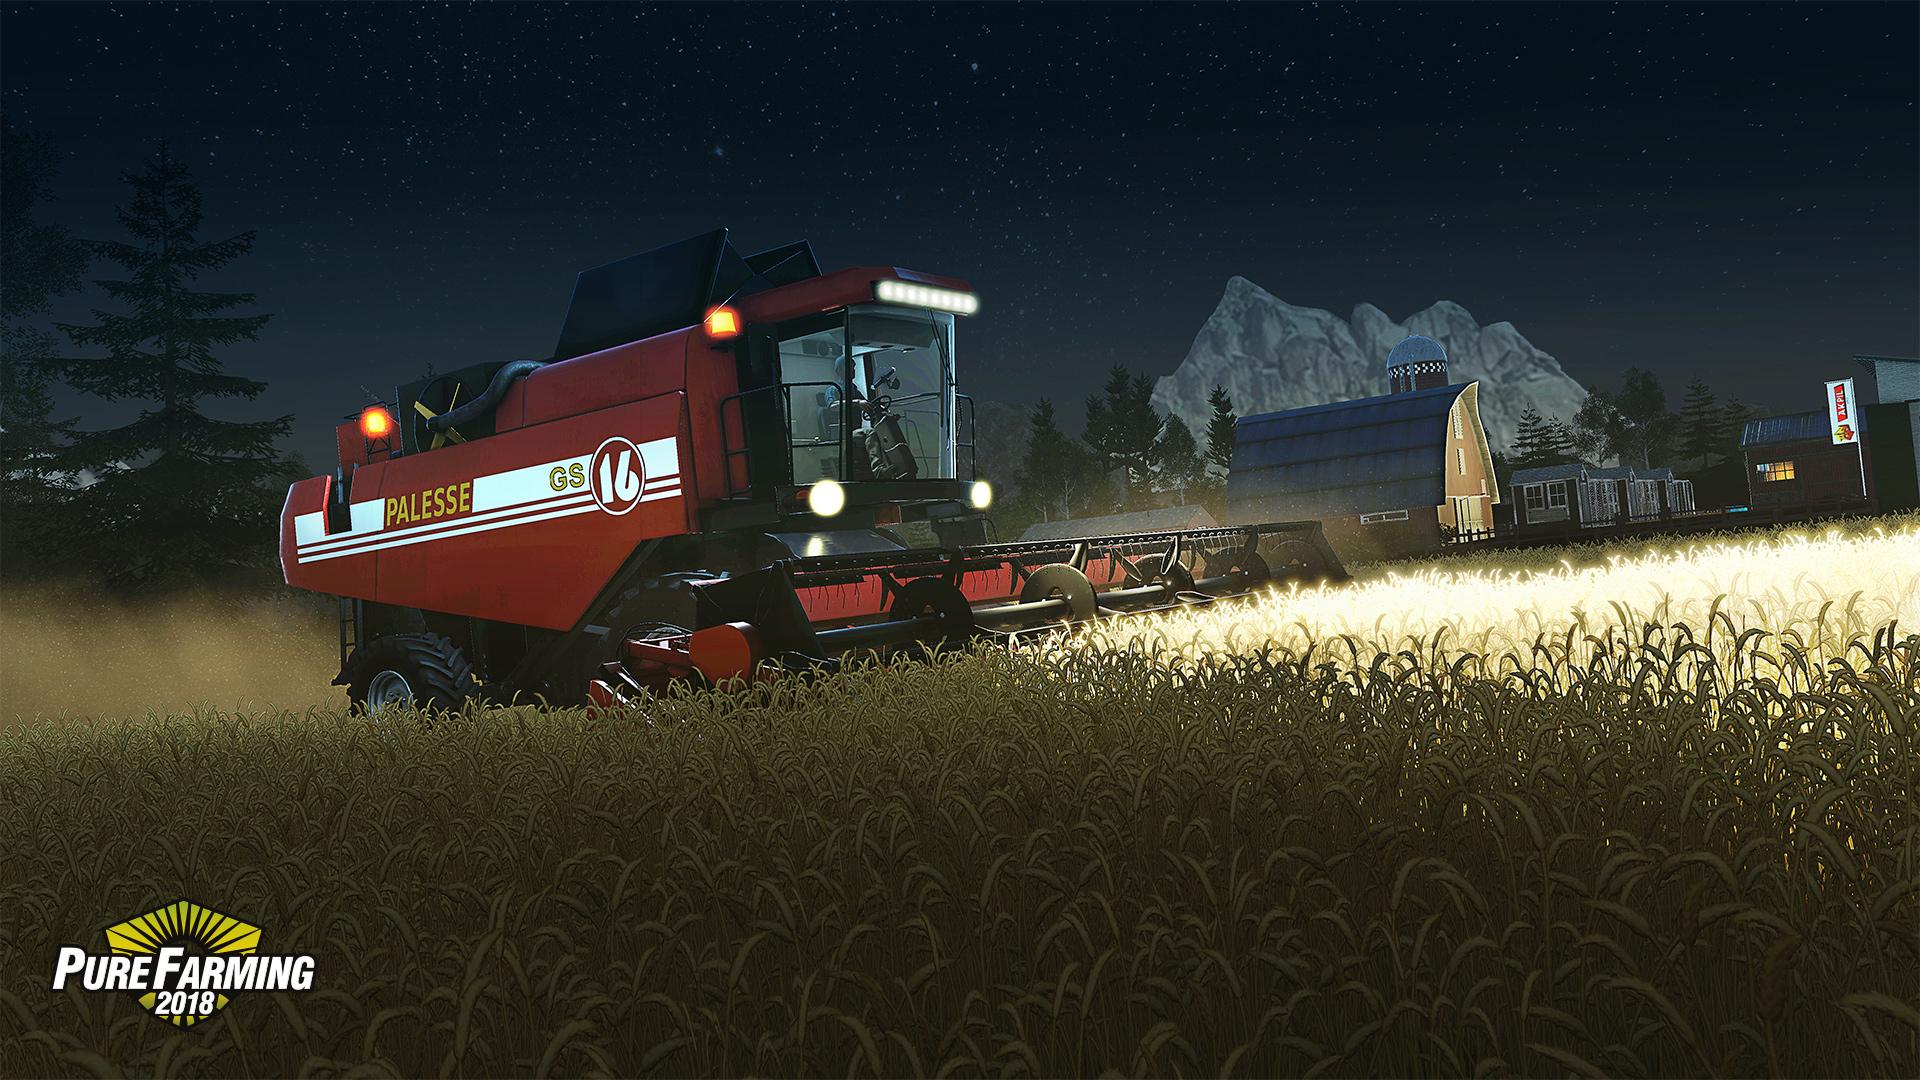 http://www.idgtv.es/archivos/201804/pure-farming-2018-img6.jpg